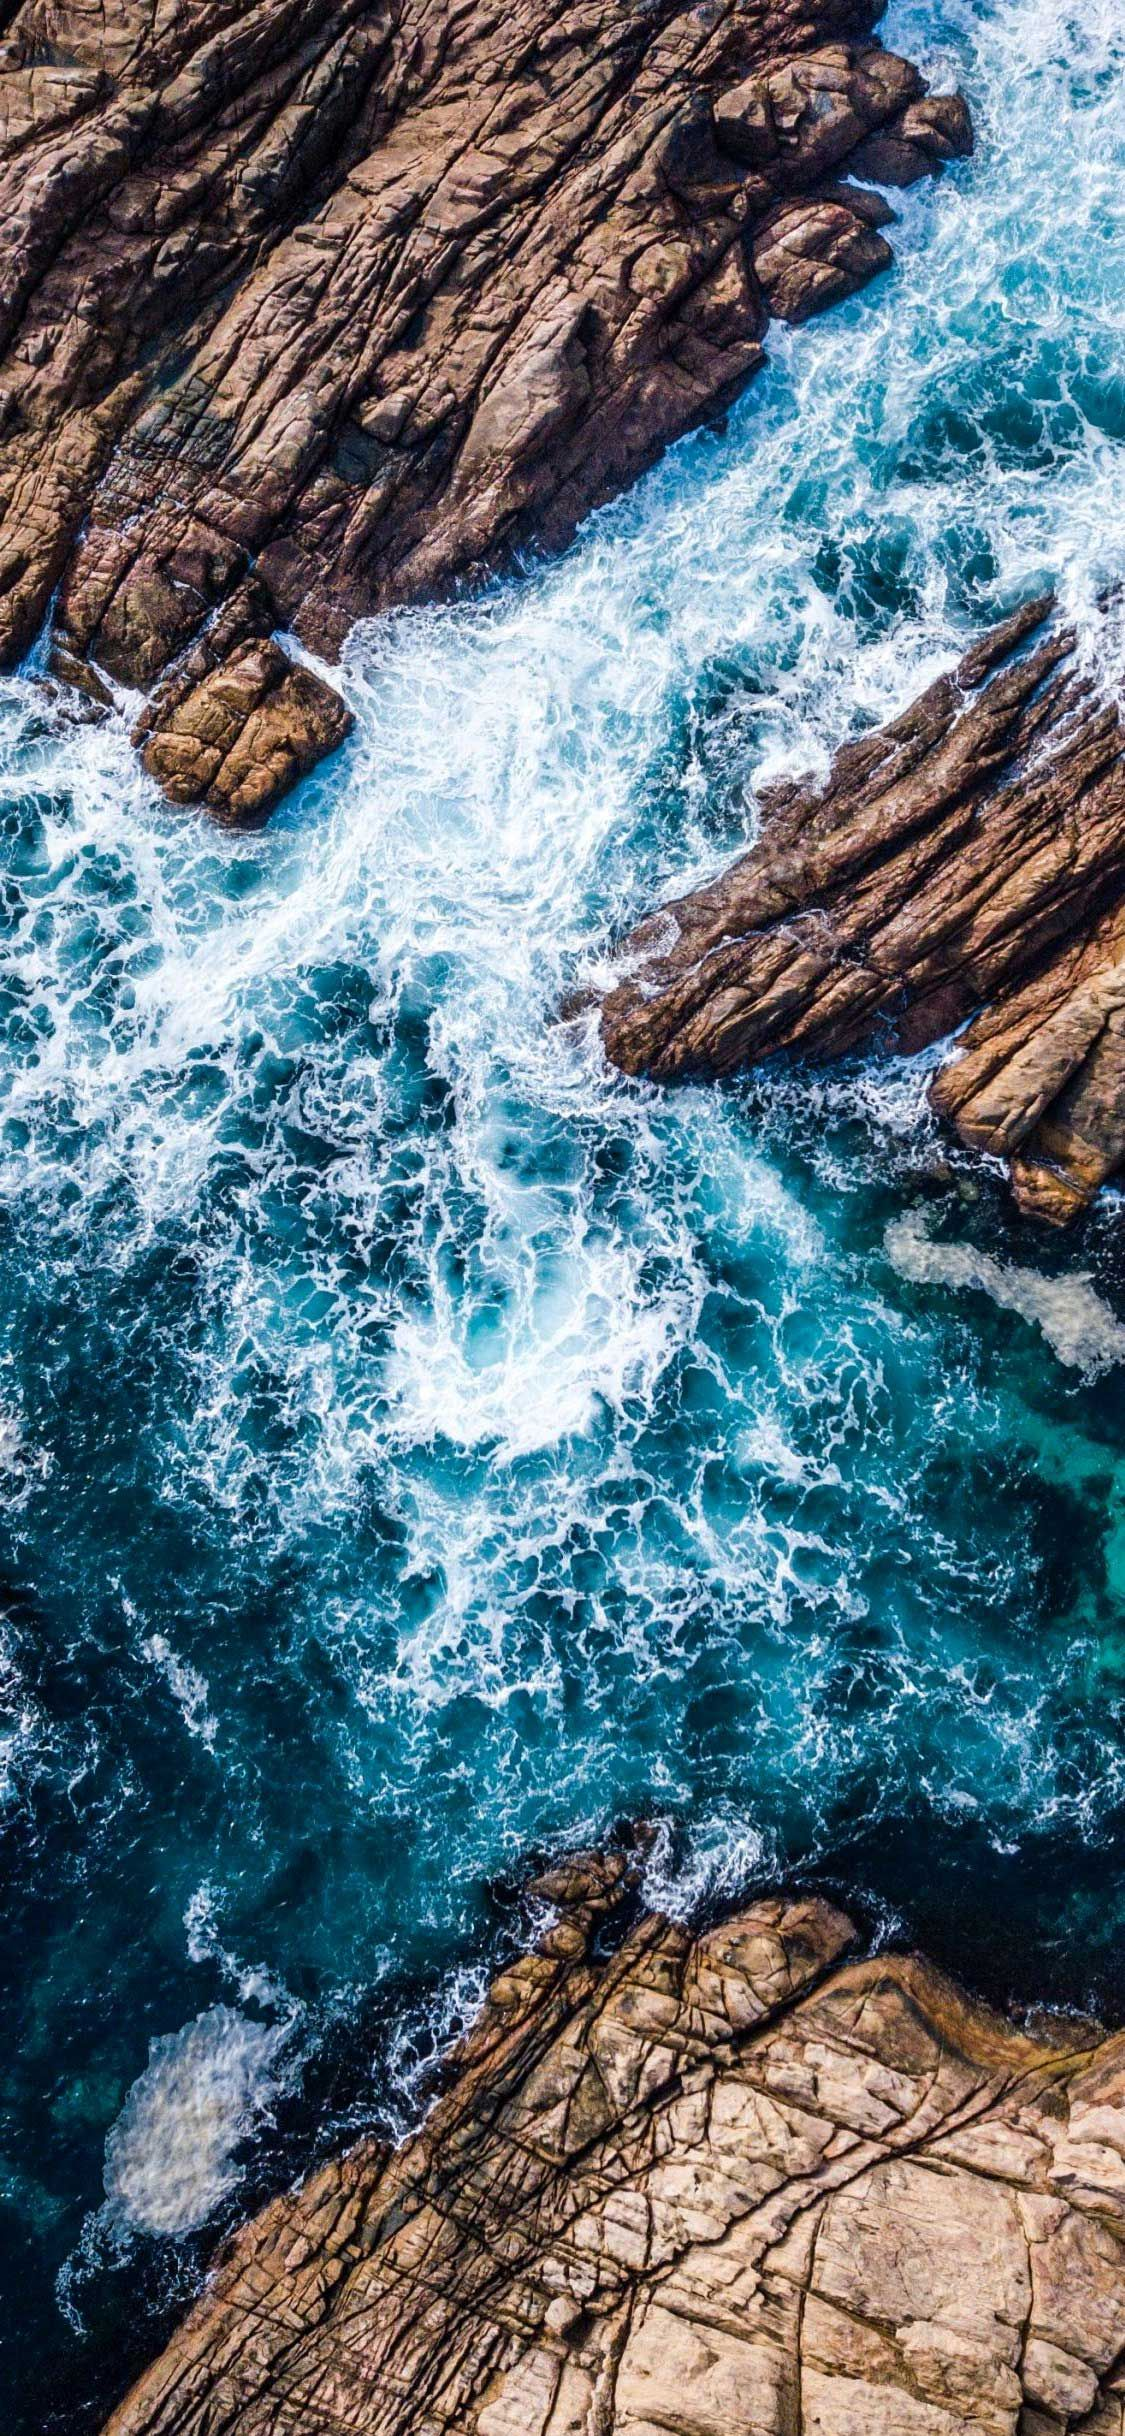 Iphone Wallpaper Canal Rocks Ocean Aerial View Coastline Australia K Hd Beach Wallpaper Iphone Iphone Wallpaper Ocean Ocean Wallpaper Wallpaper beach sea waves rocks coast